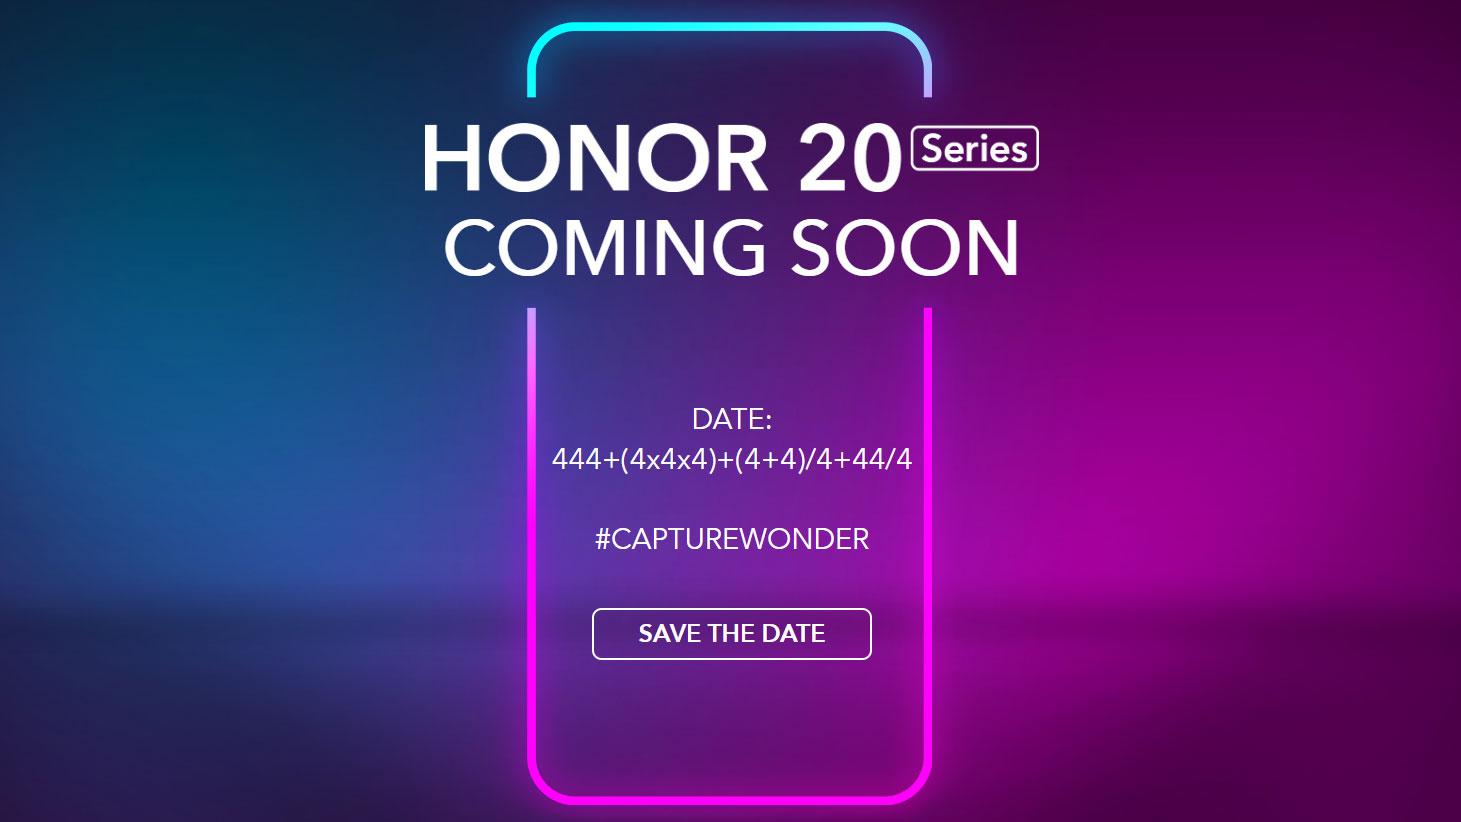 Honor launch date confirmed for iNKZvdSv49M2Y7nfnP36